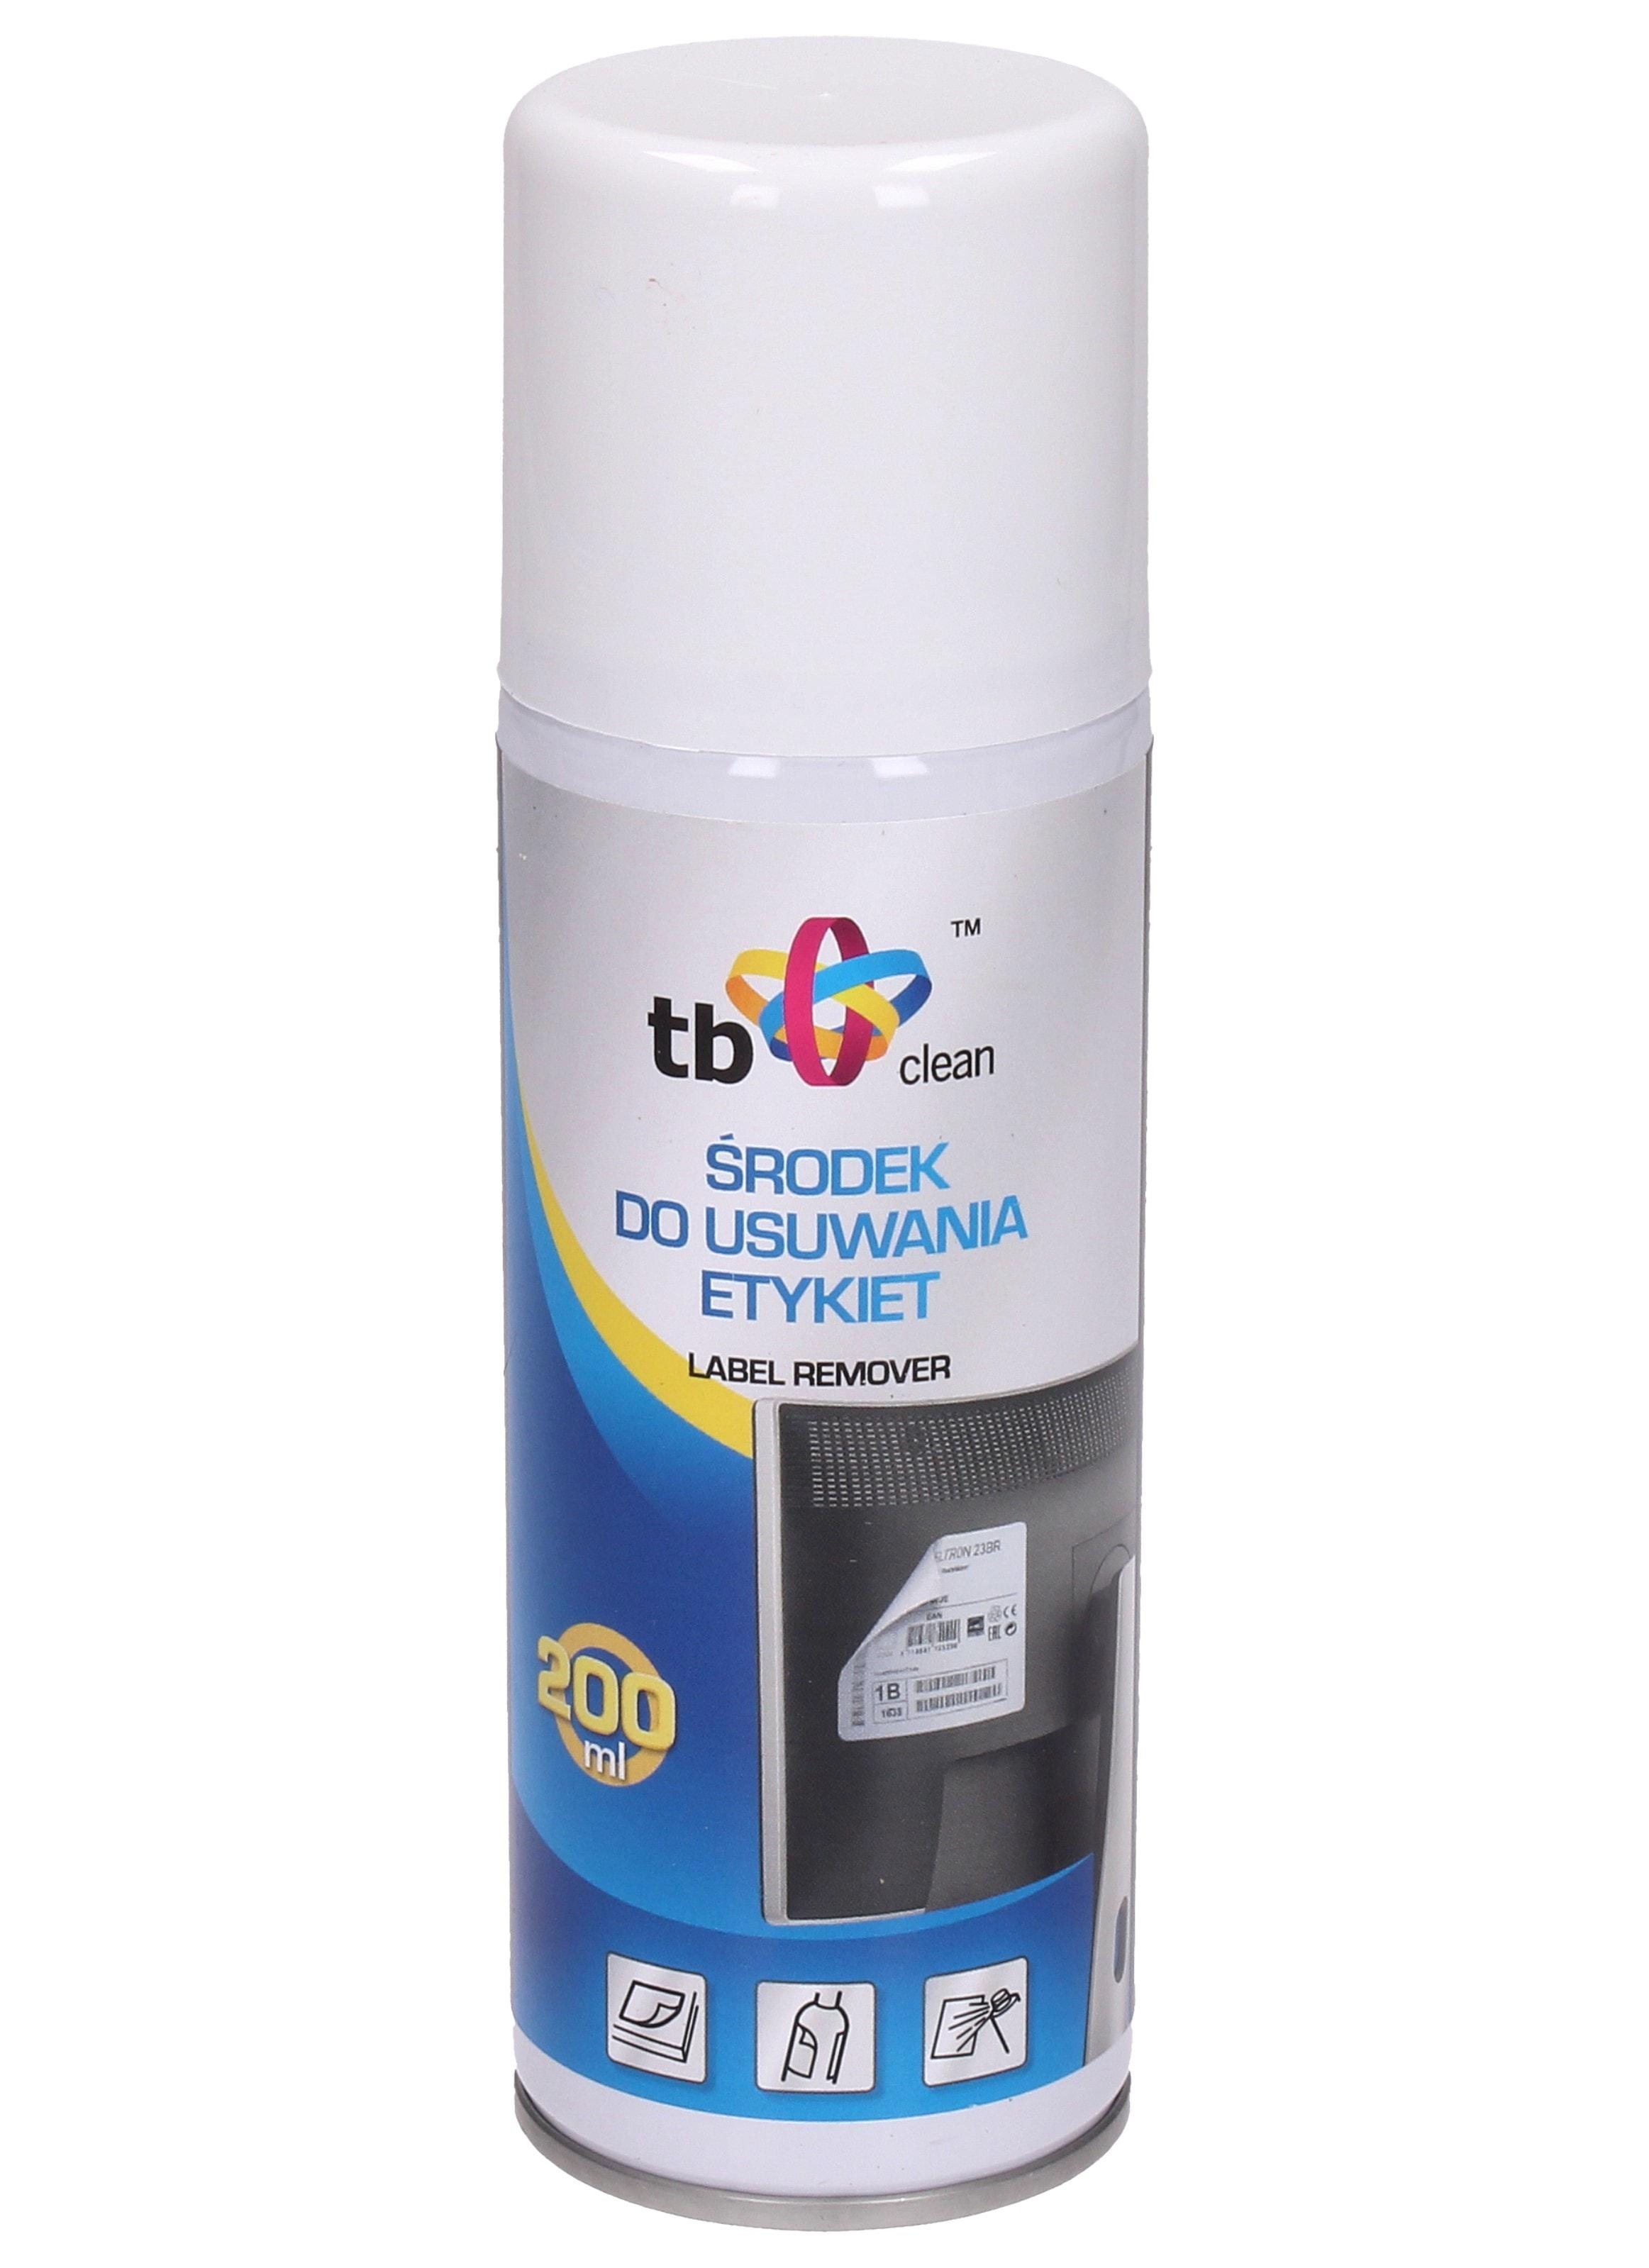 TB Clean Odstraňovač etiket 200 ml - ABTBCSE00000SUE